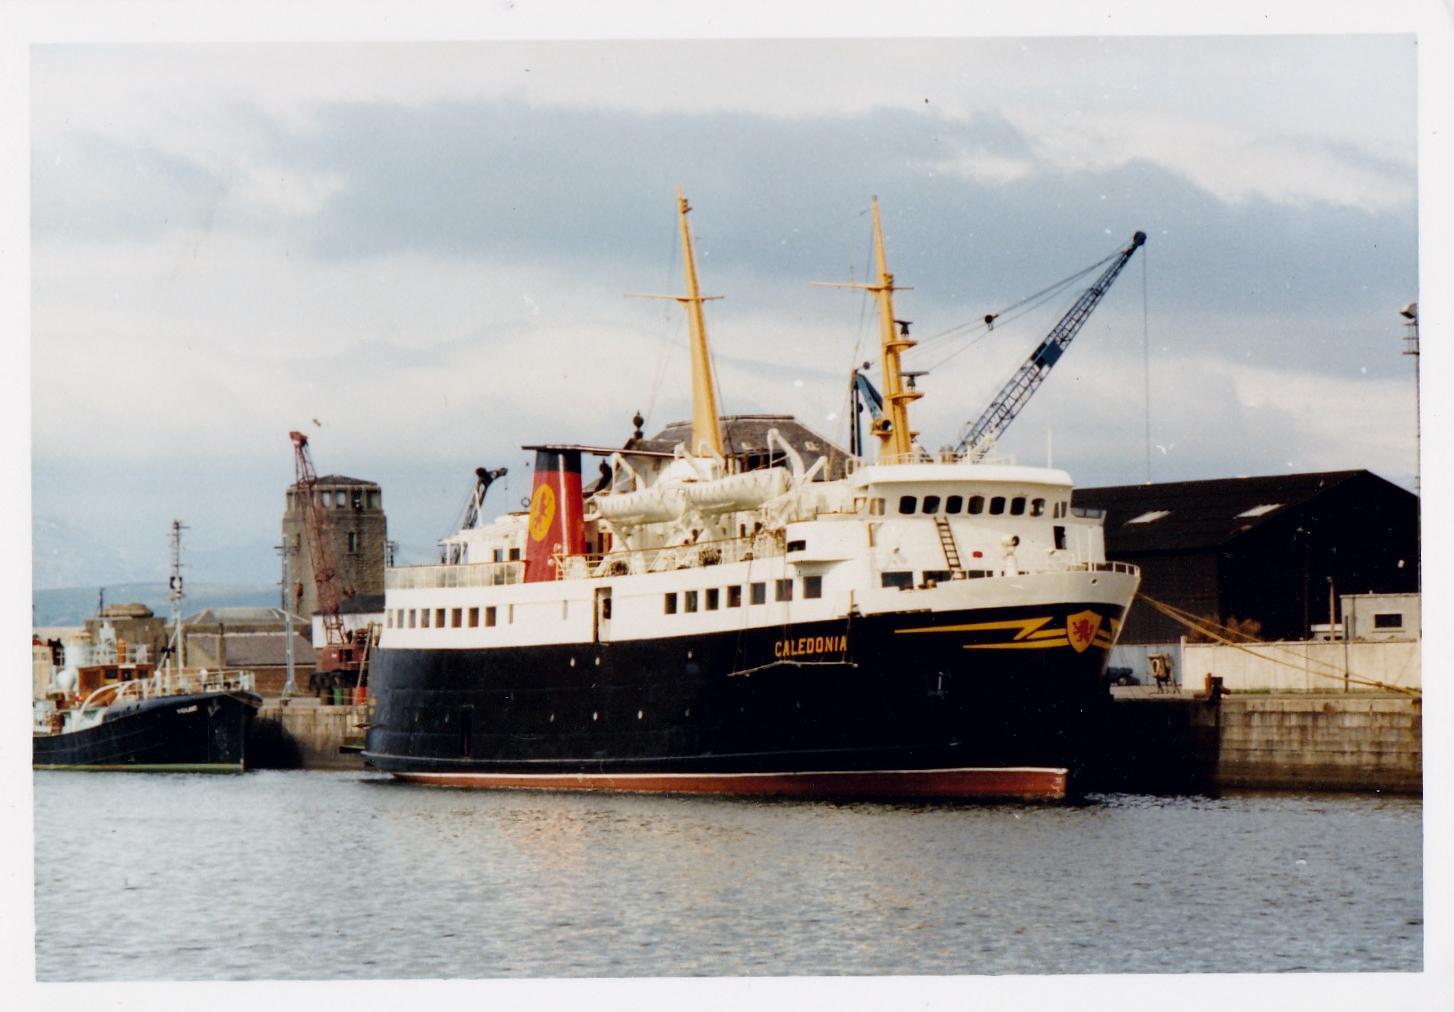 Caledonia in James Watt Dock (Jim Aikman Smith)